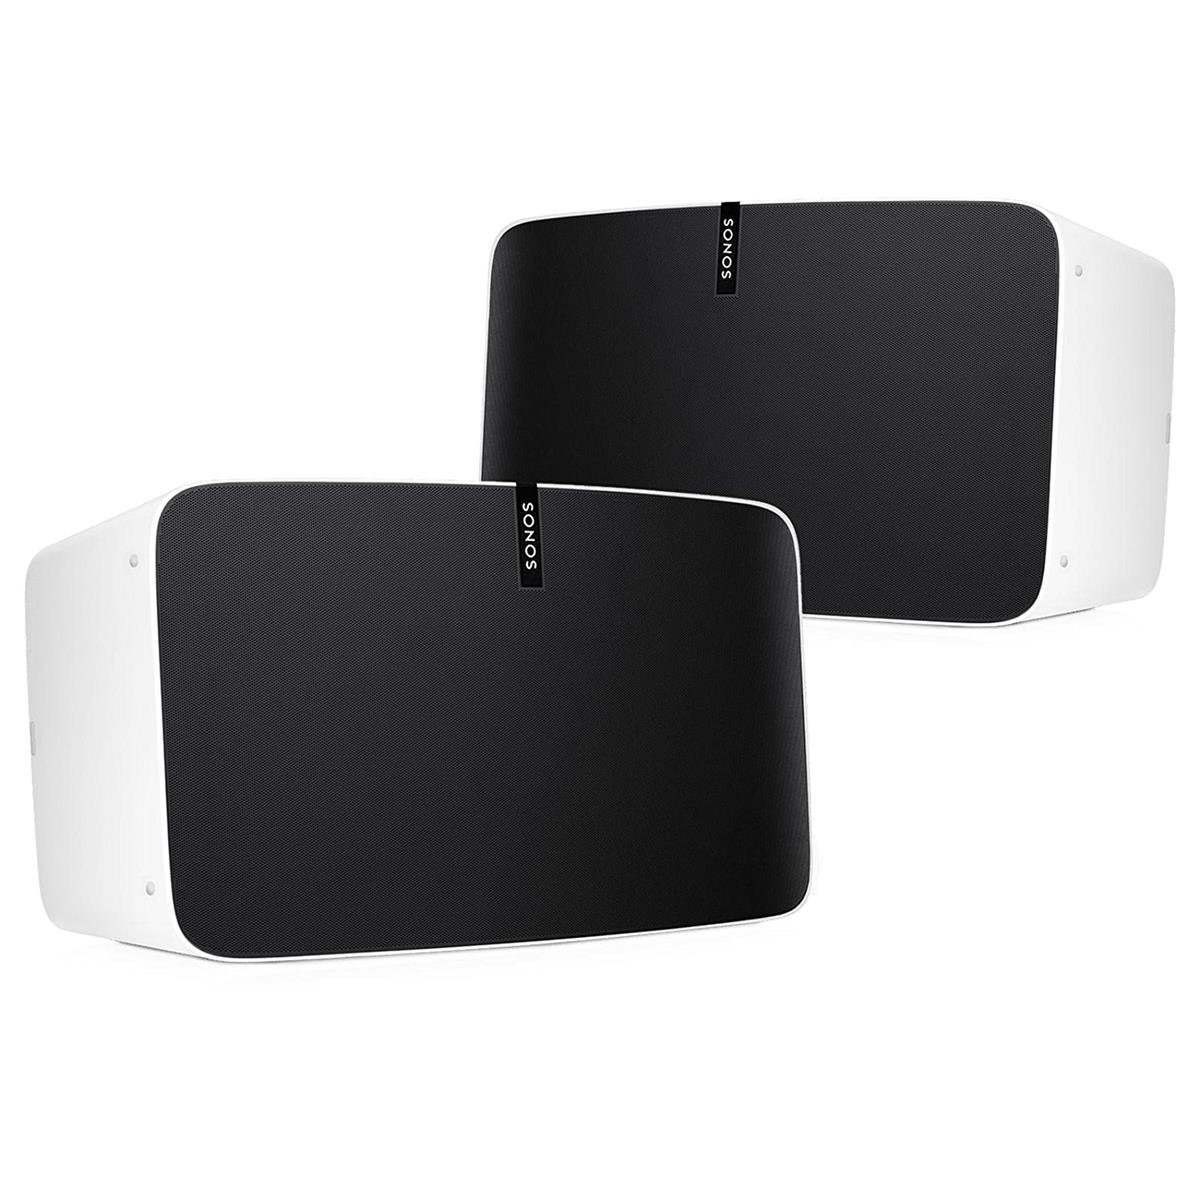 Sonos Play:5 Multi-Room Digital Music System Bundle (2 - Play:5 Speakers) - White